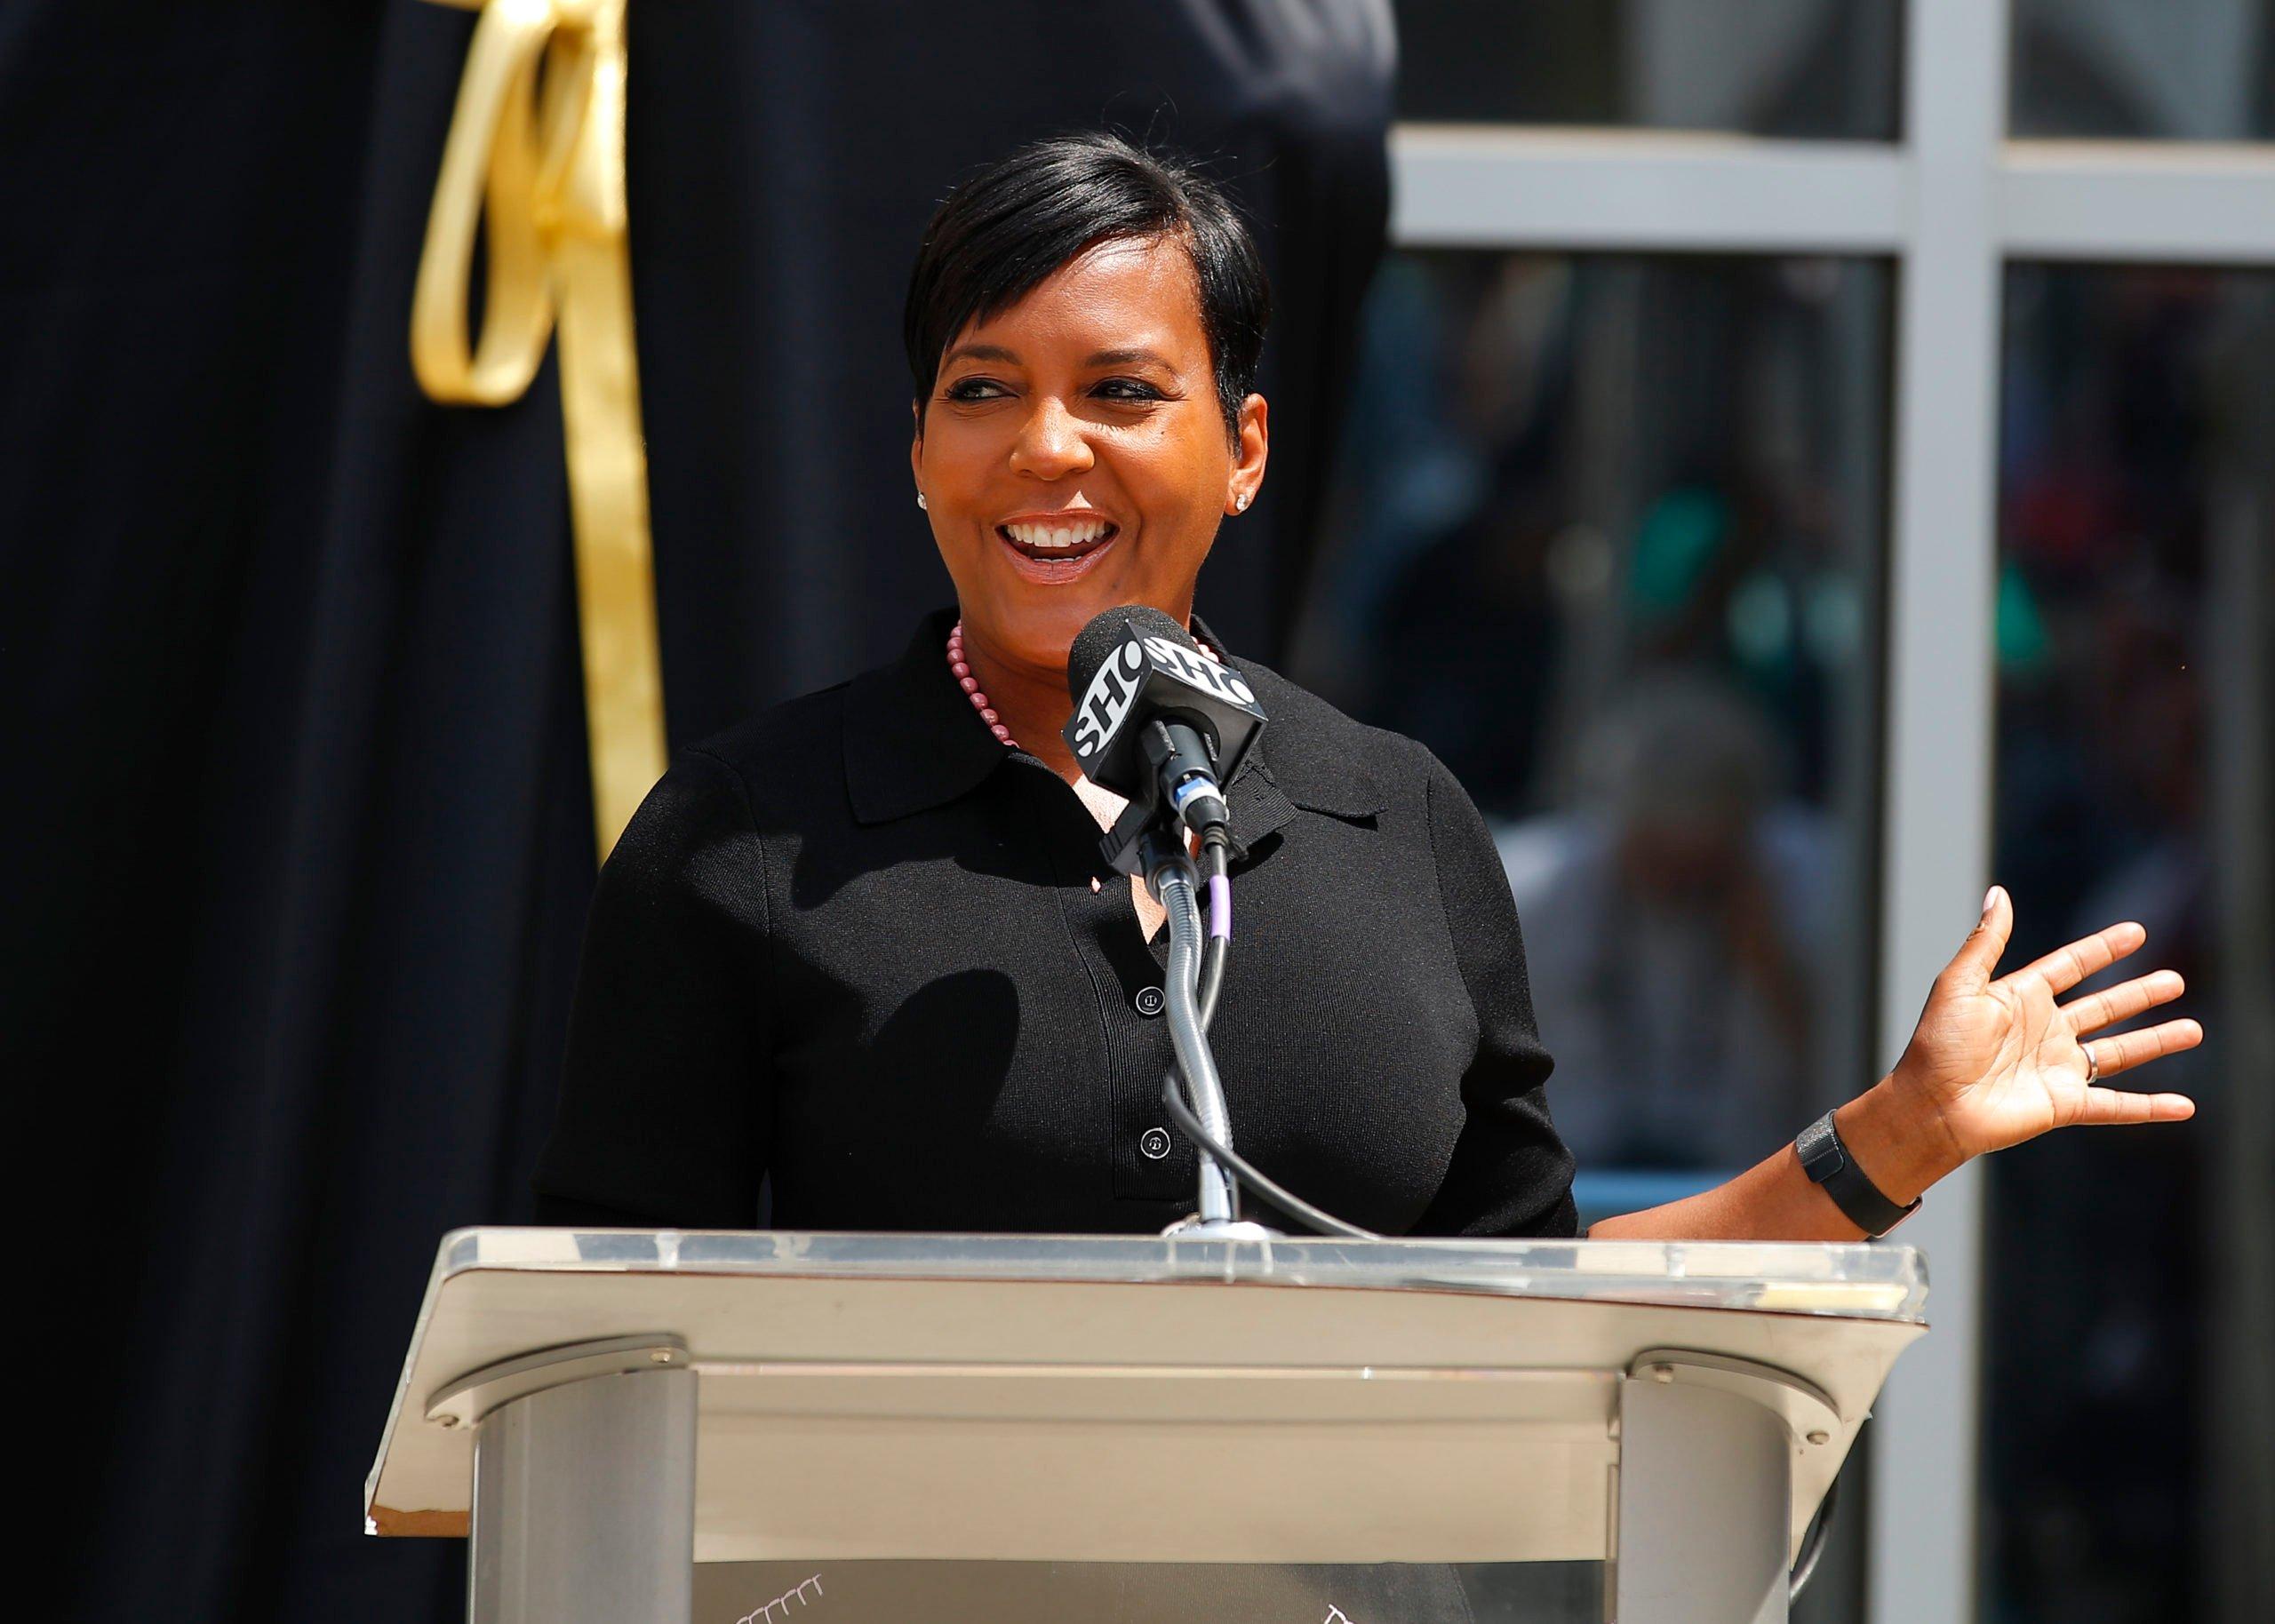 ATLANTA, GA - JUNE 25: Mayor of Atlanta, Keisha Lance Bottoms speaks prior to the unveiling of the Evander Holyfield statue at State Farm Arena on June 25, 2021 in Atlanta, Georgia. (Photo by Todd Kirkland/Getty Images)